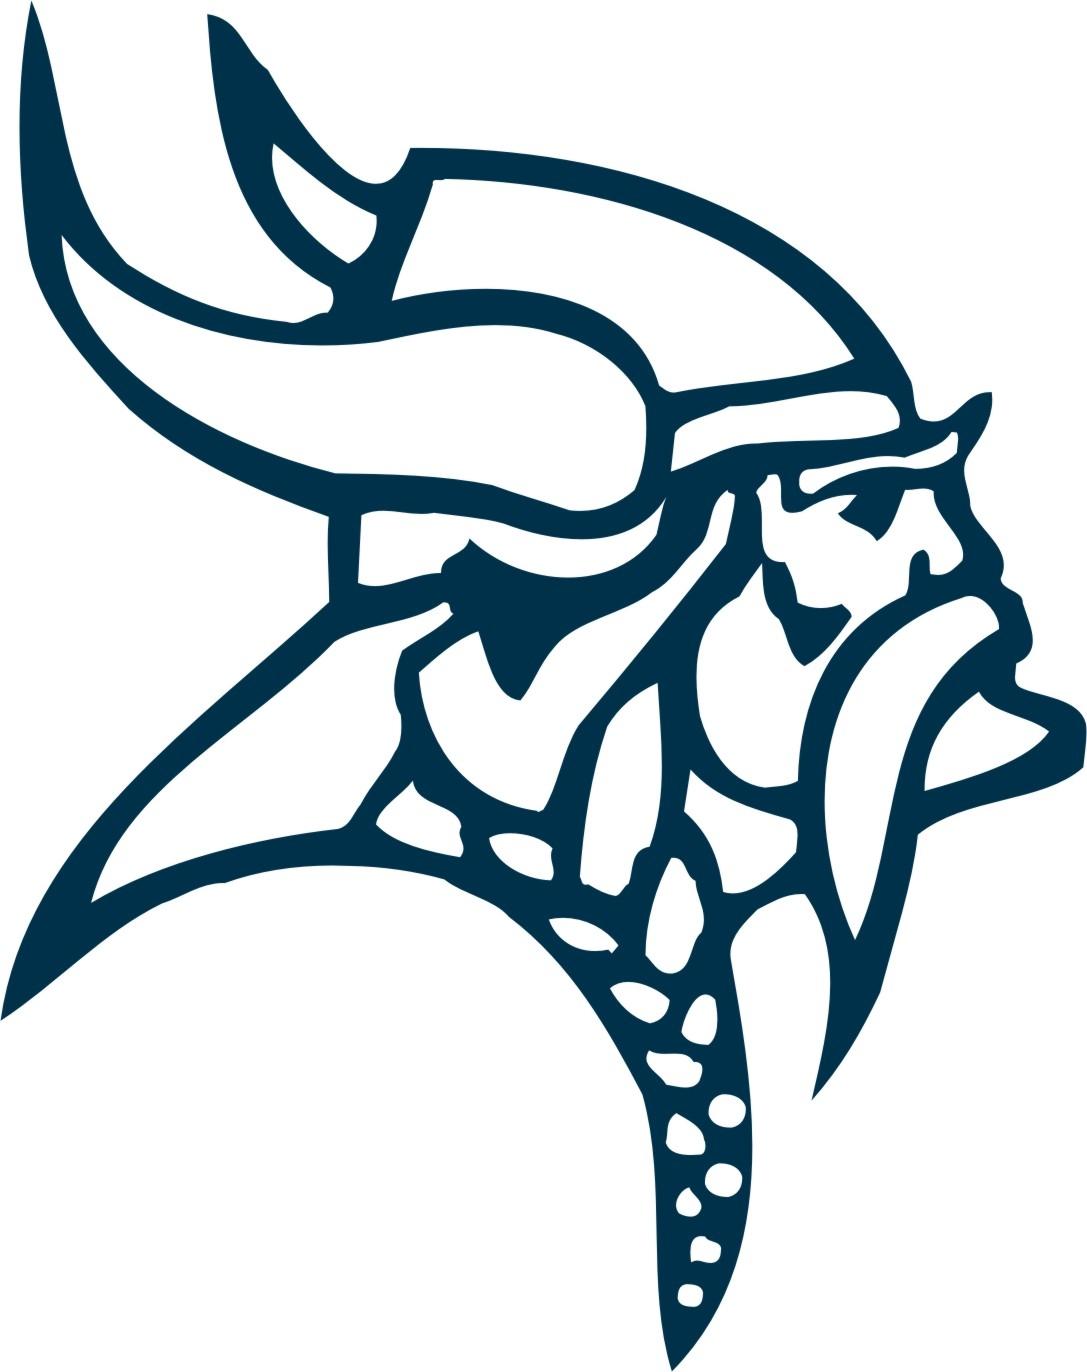 1087x1372 Minnesota Vikings Clipart 4